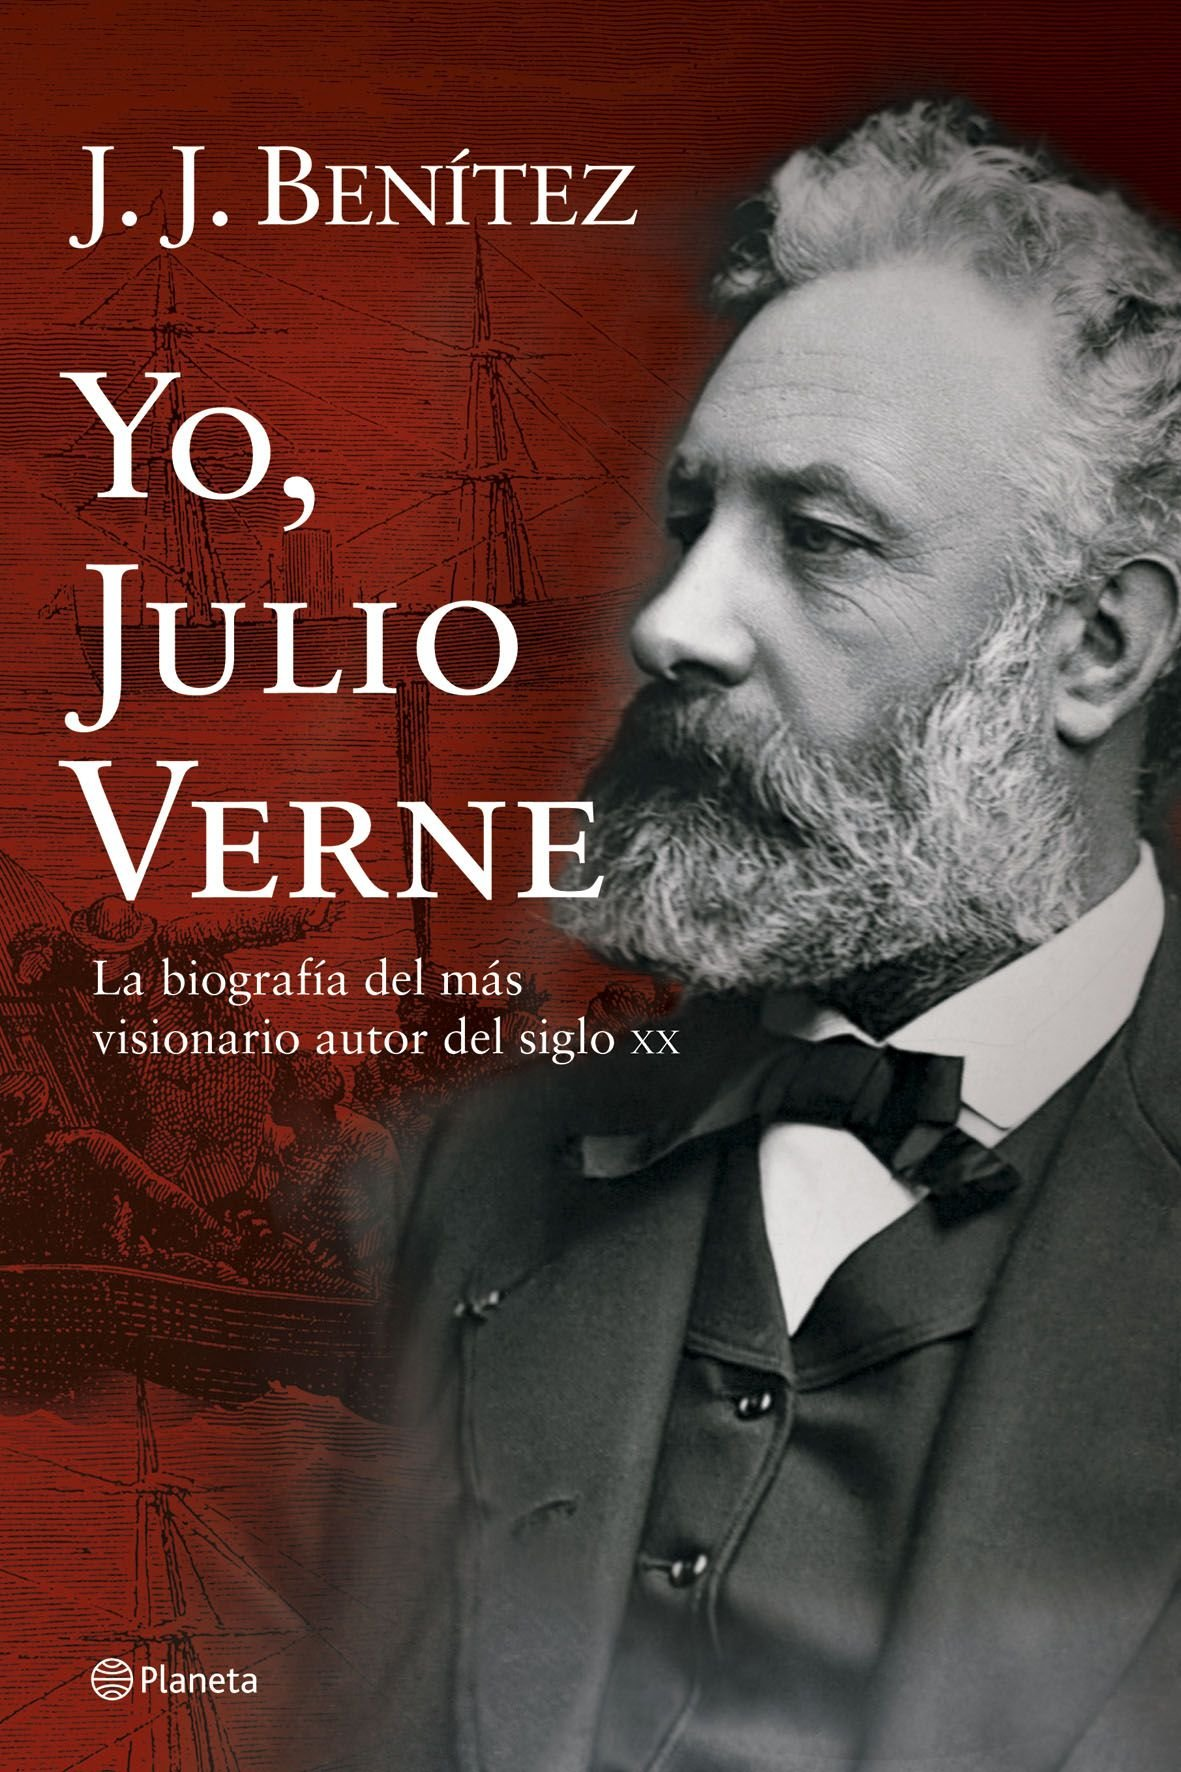 Yo, Julio Verne (Biblioteca J. J. Benítez): Amazon.es: J. J. ...